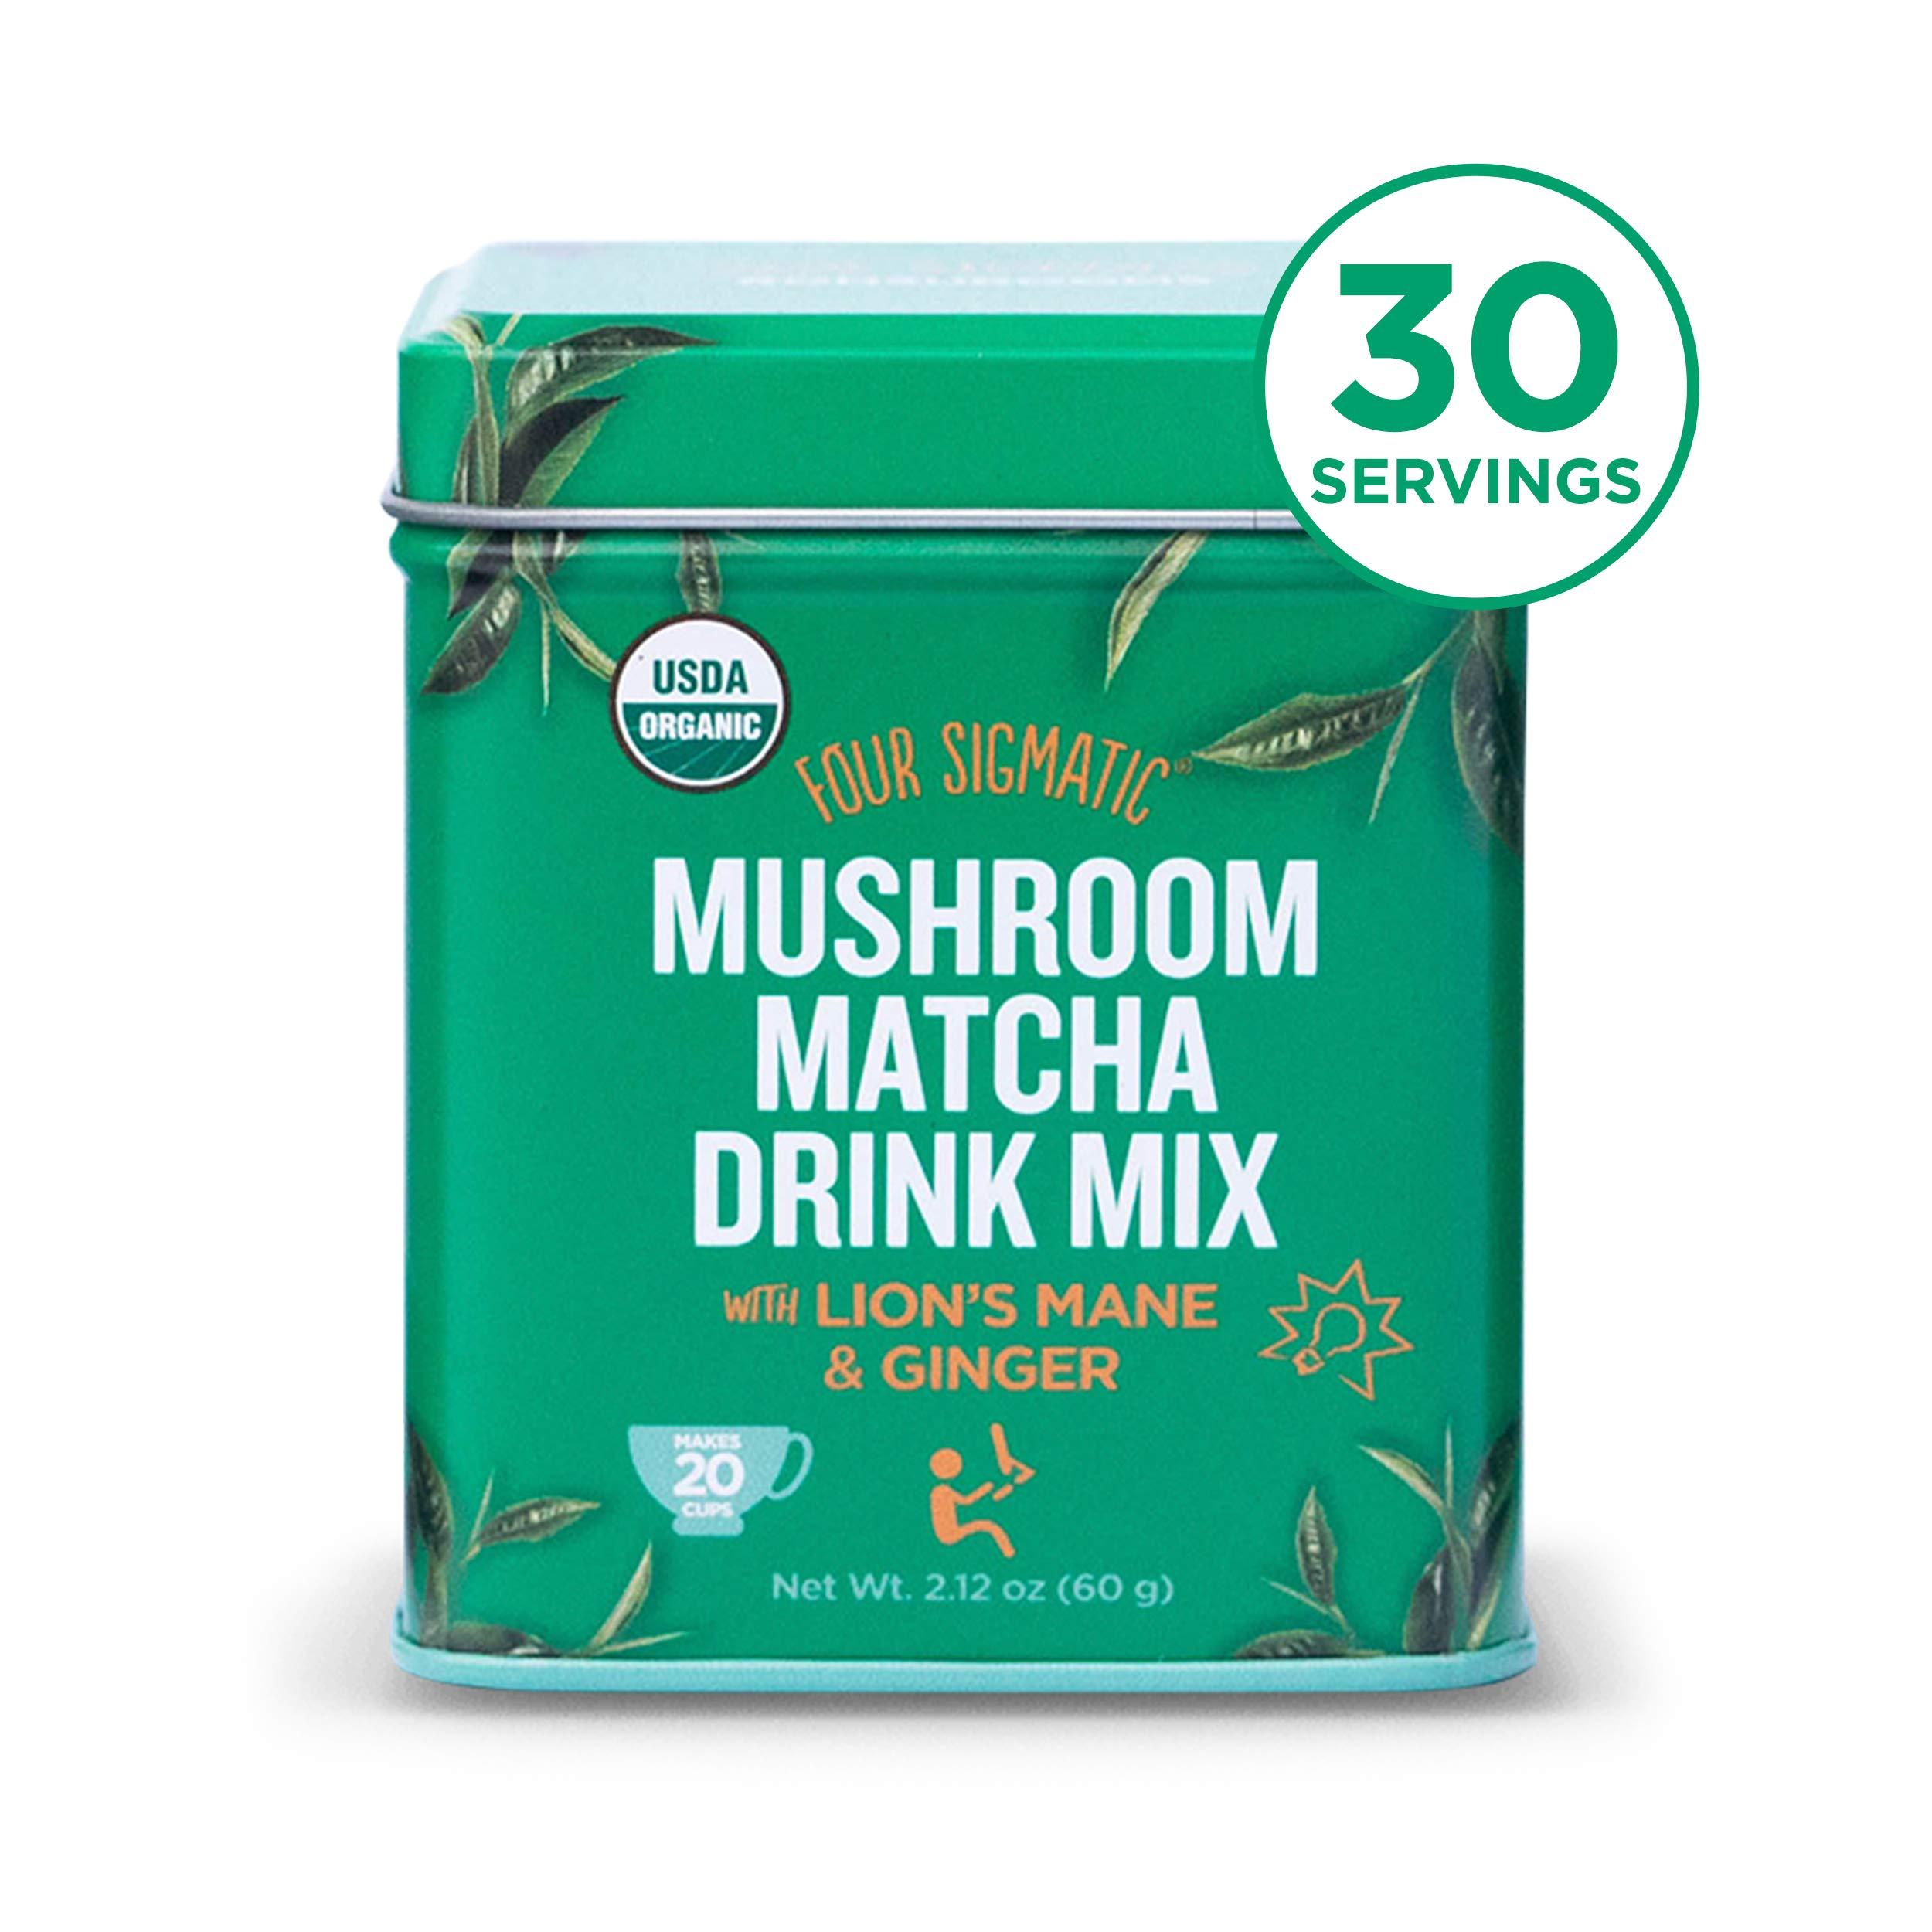 Four Sigmatic Mushroom Matcha, USDA Organic, Ceremonial Grade Matcha Grean Tea Powder with Lions Mane Mushroom Powder & Ginger, Balanced Energy & Focus, Vegan, Paleo, 60g - 20 servings, 2.12 Ounce by Four Sigmatic